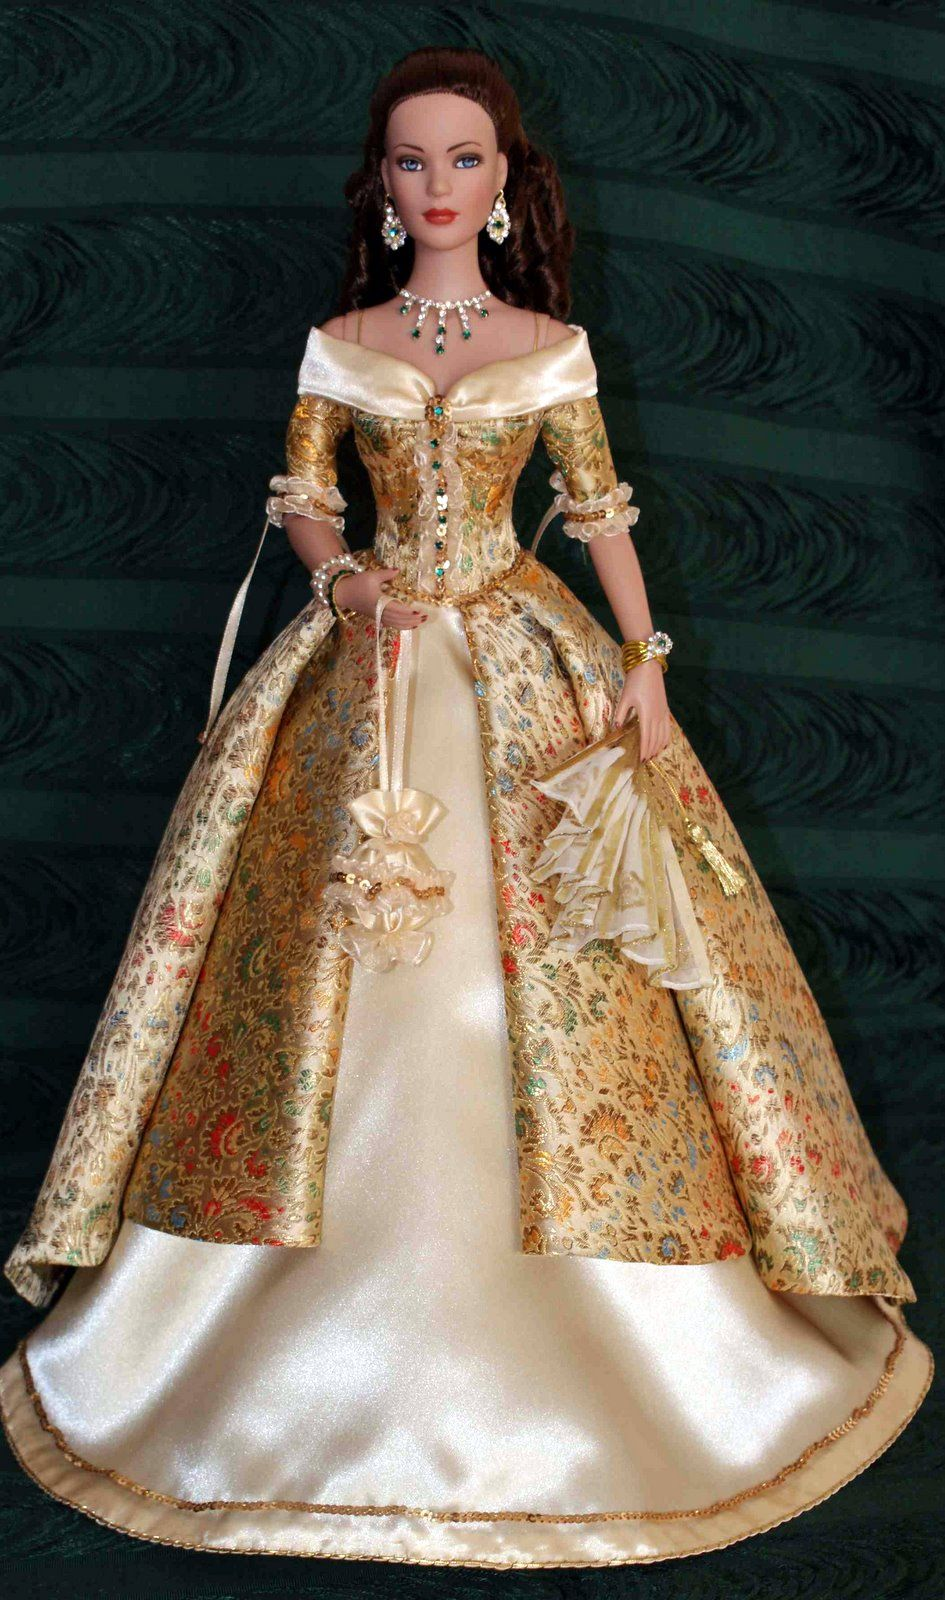 What Makes Barbie Dolls So Iconic | Barbie, Puppen und Puppentheater